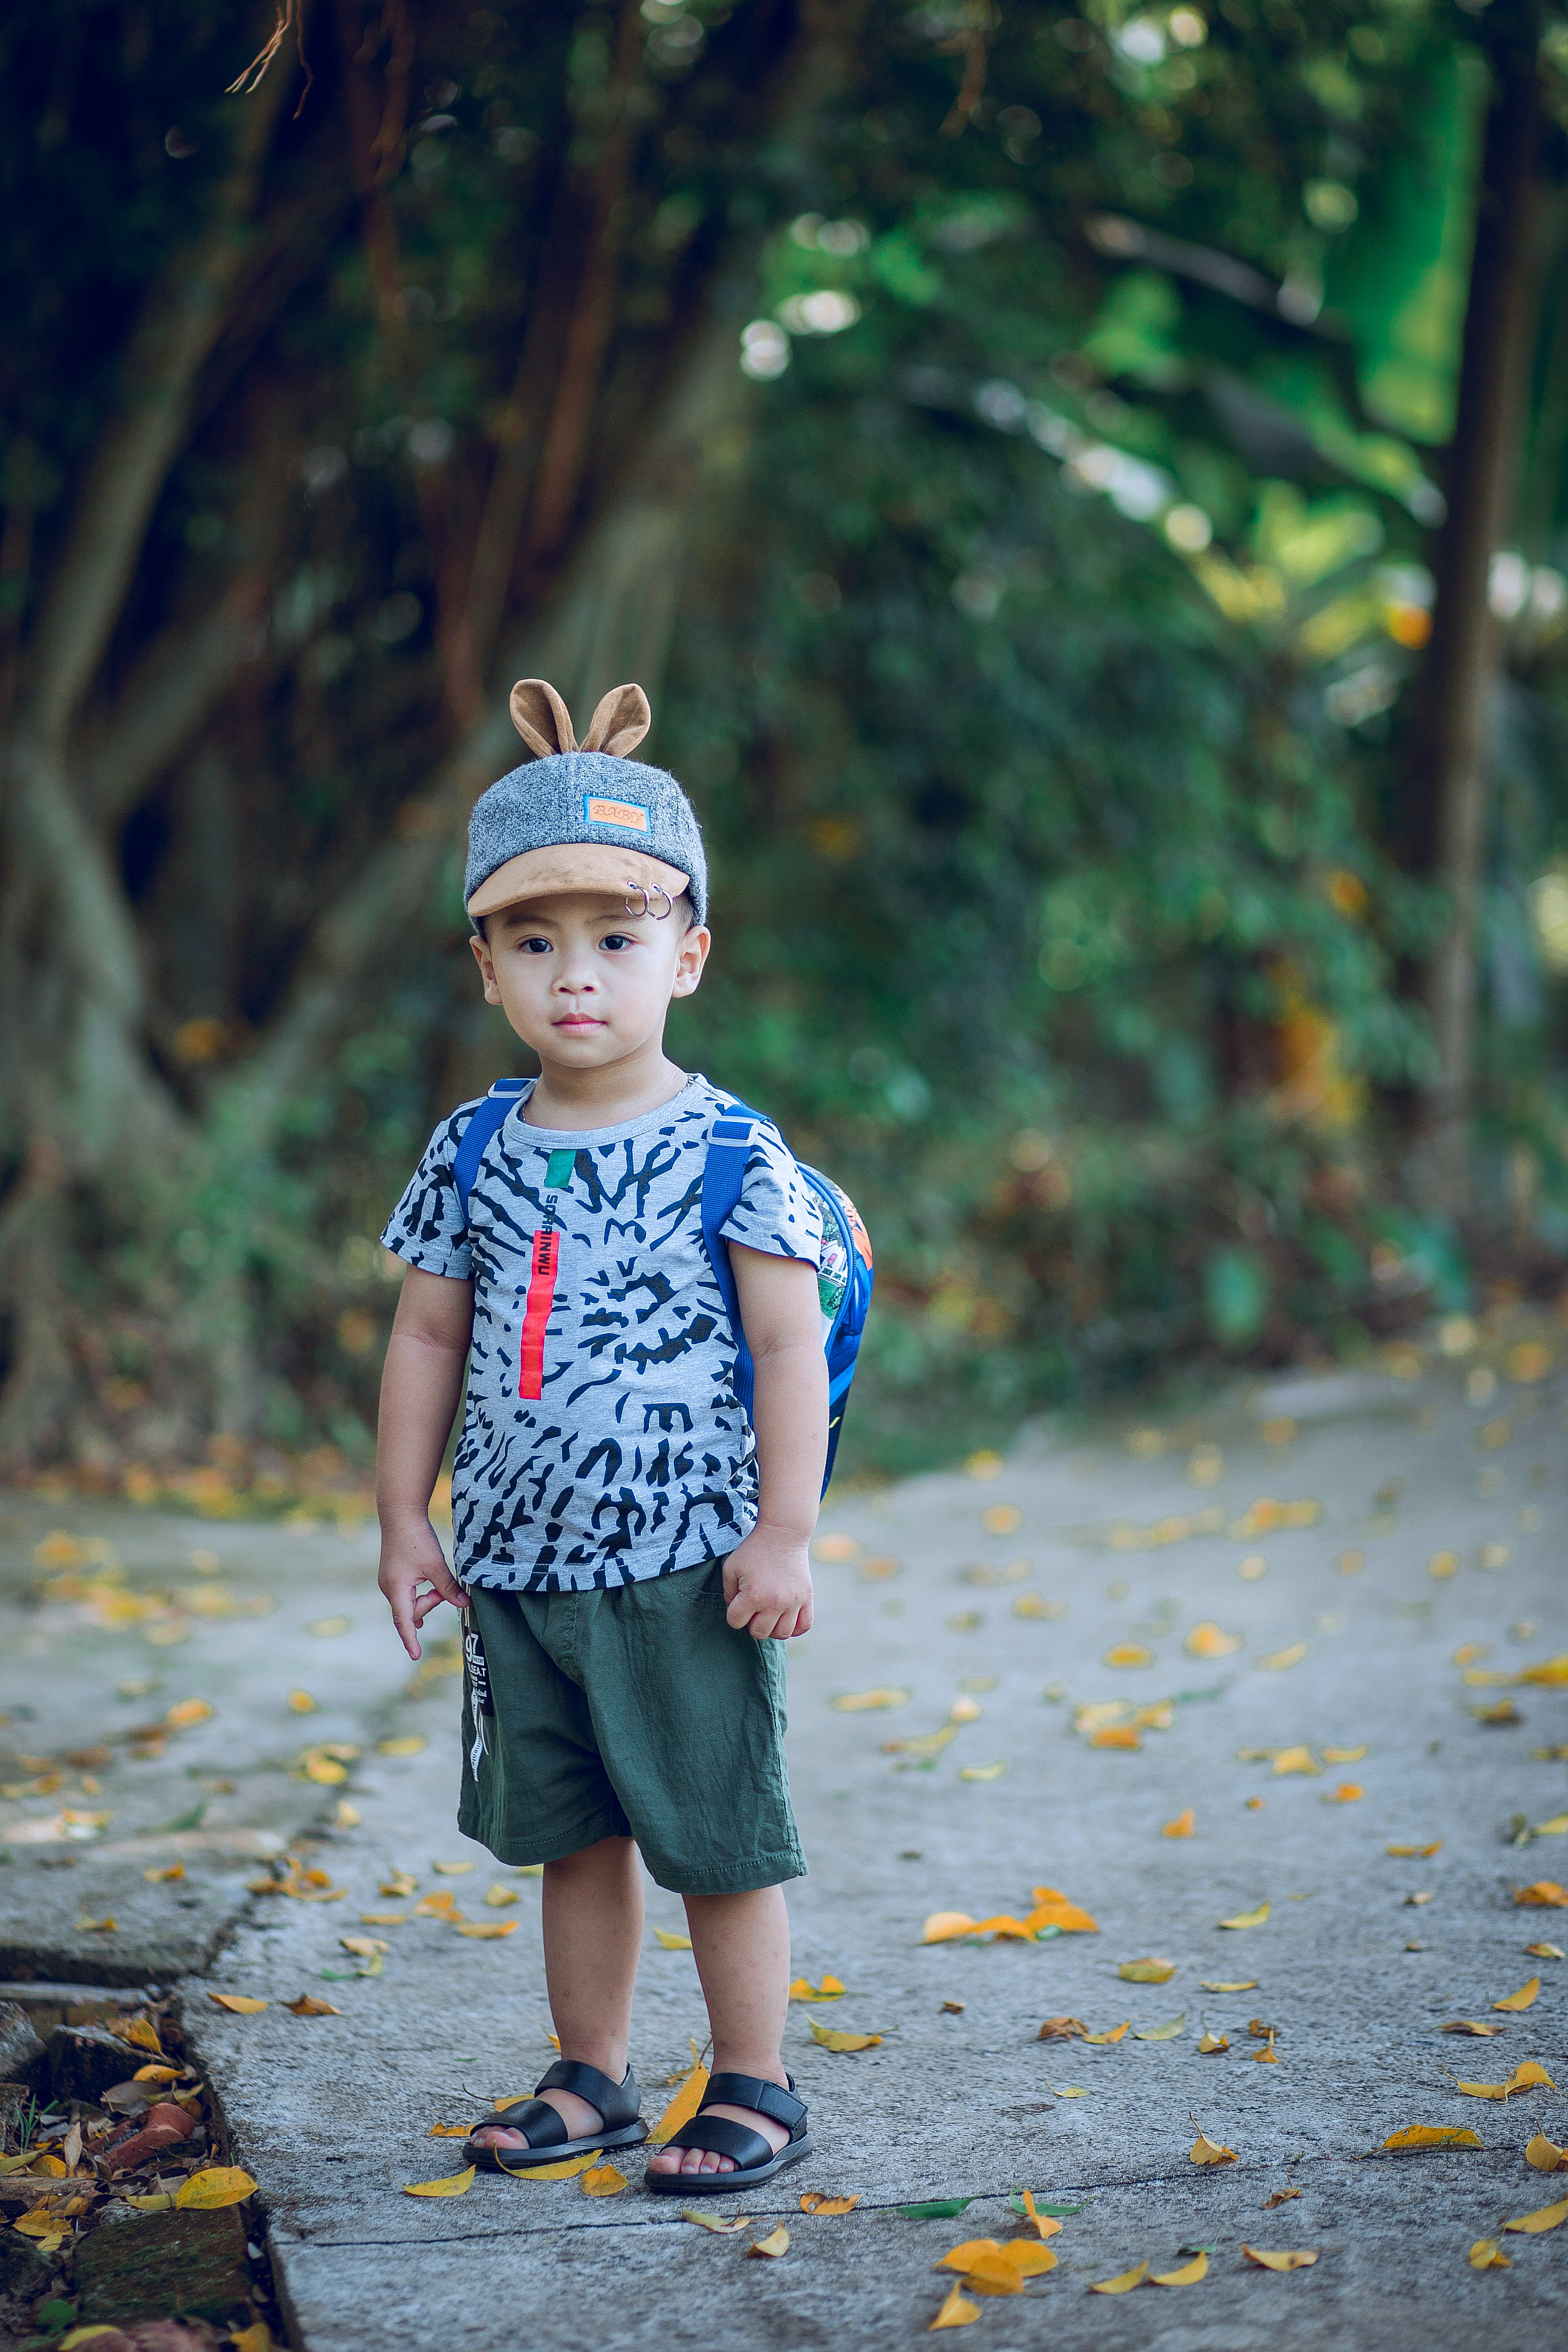 A little boy standing on concrete pathway | Photo: Pexels